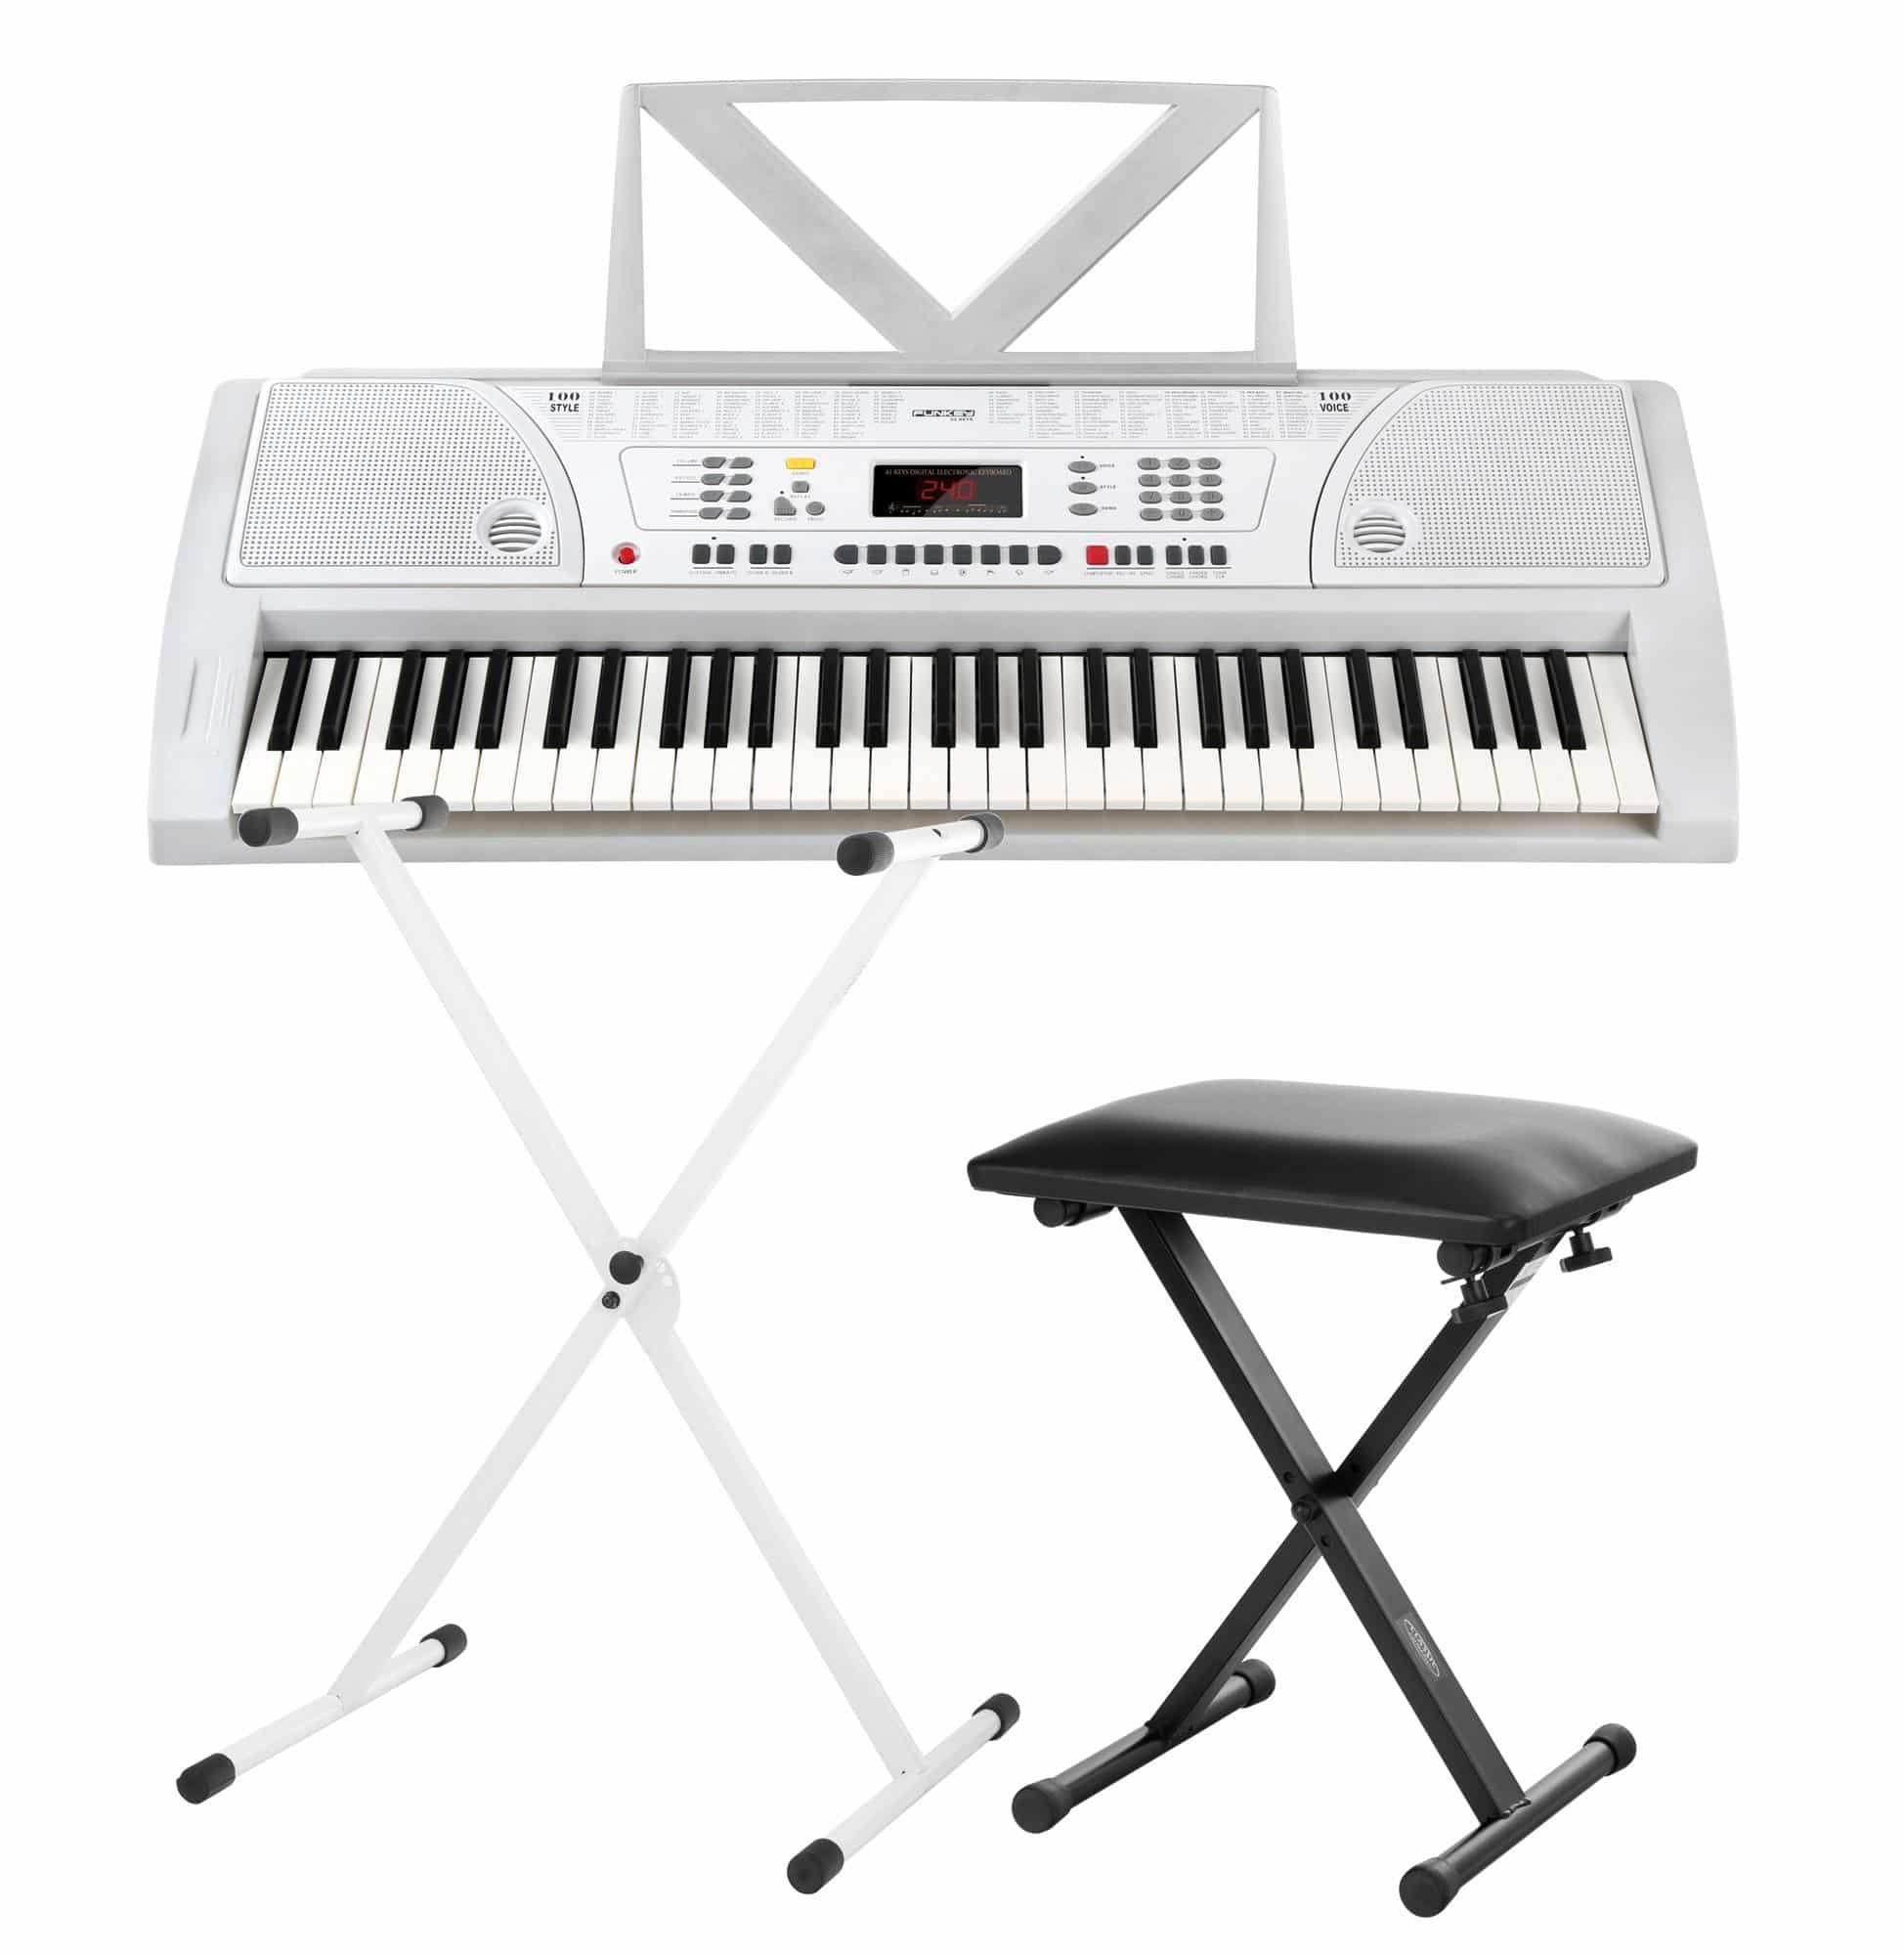 FunKey 61 Keyboard Weiß SET inkl. Keyboardständer Bank